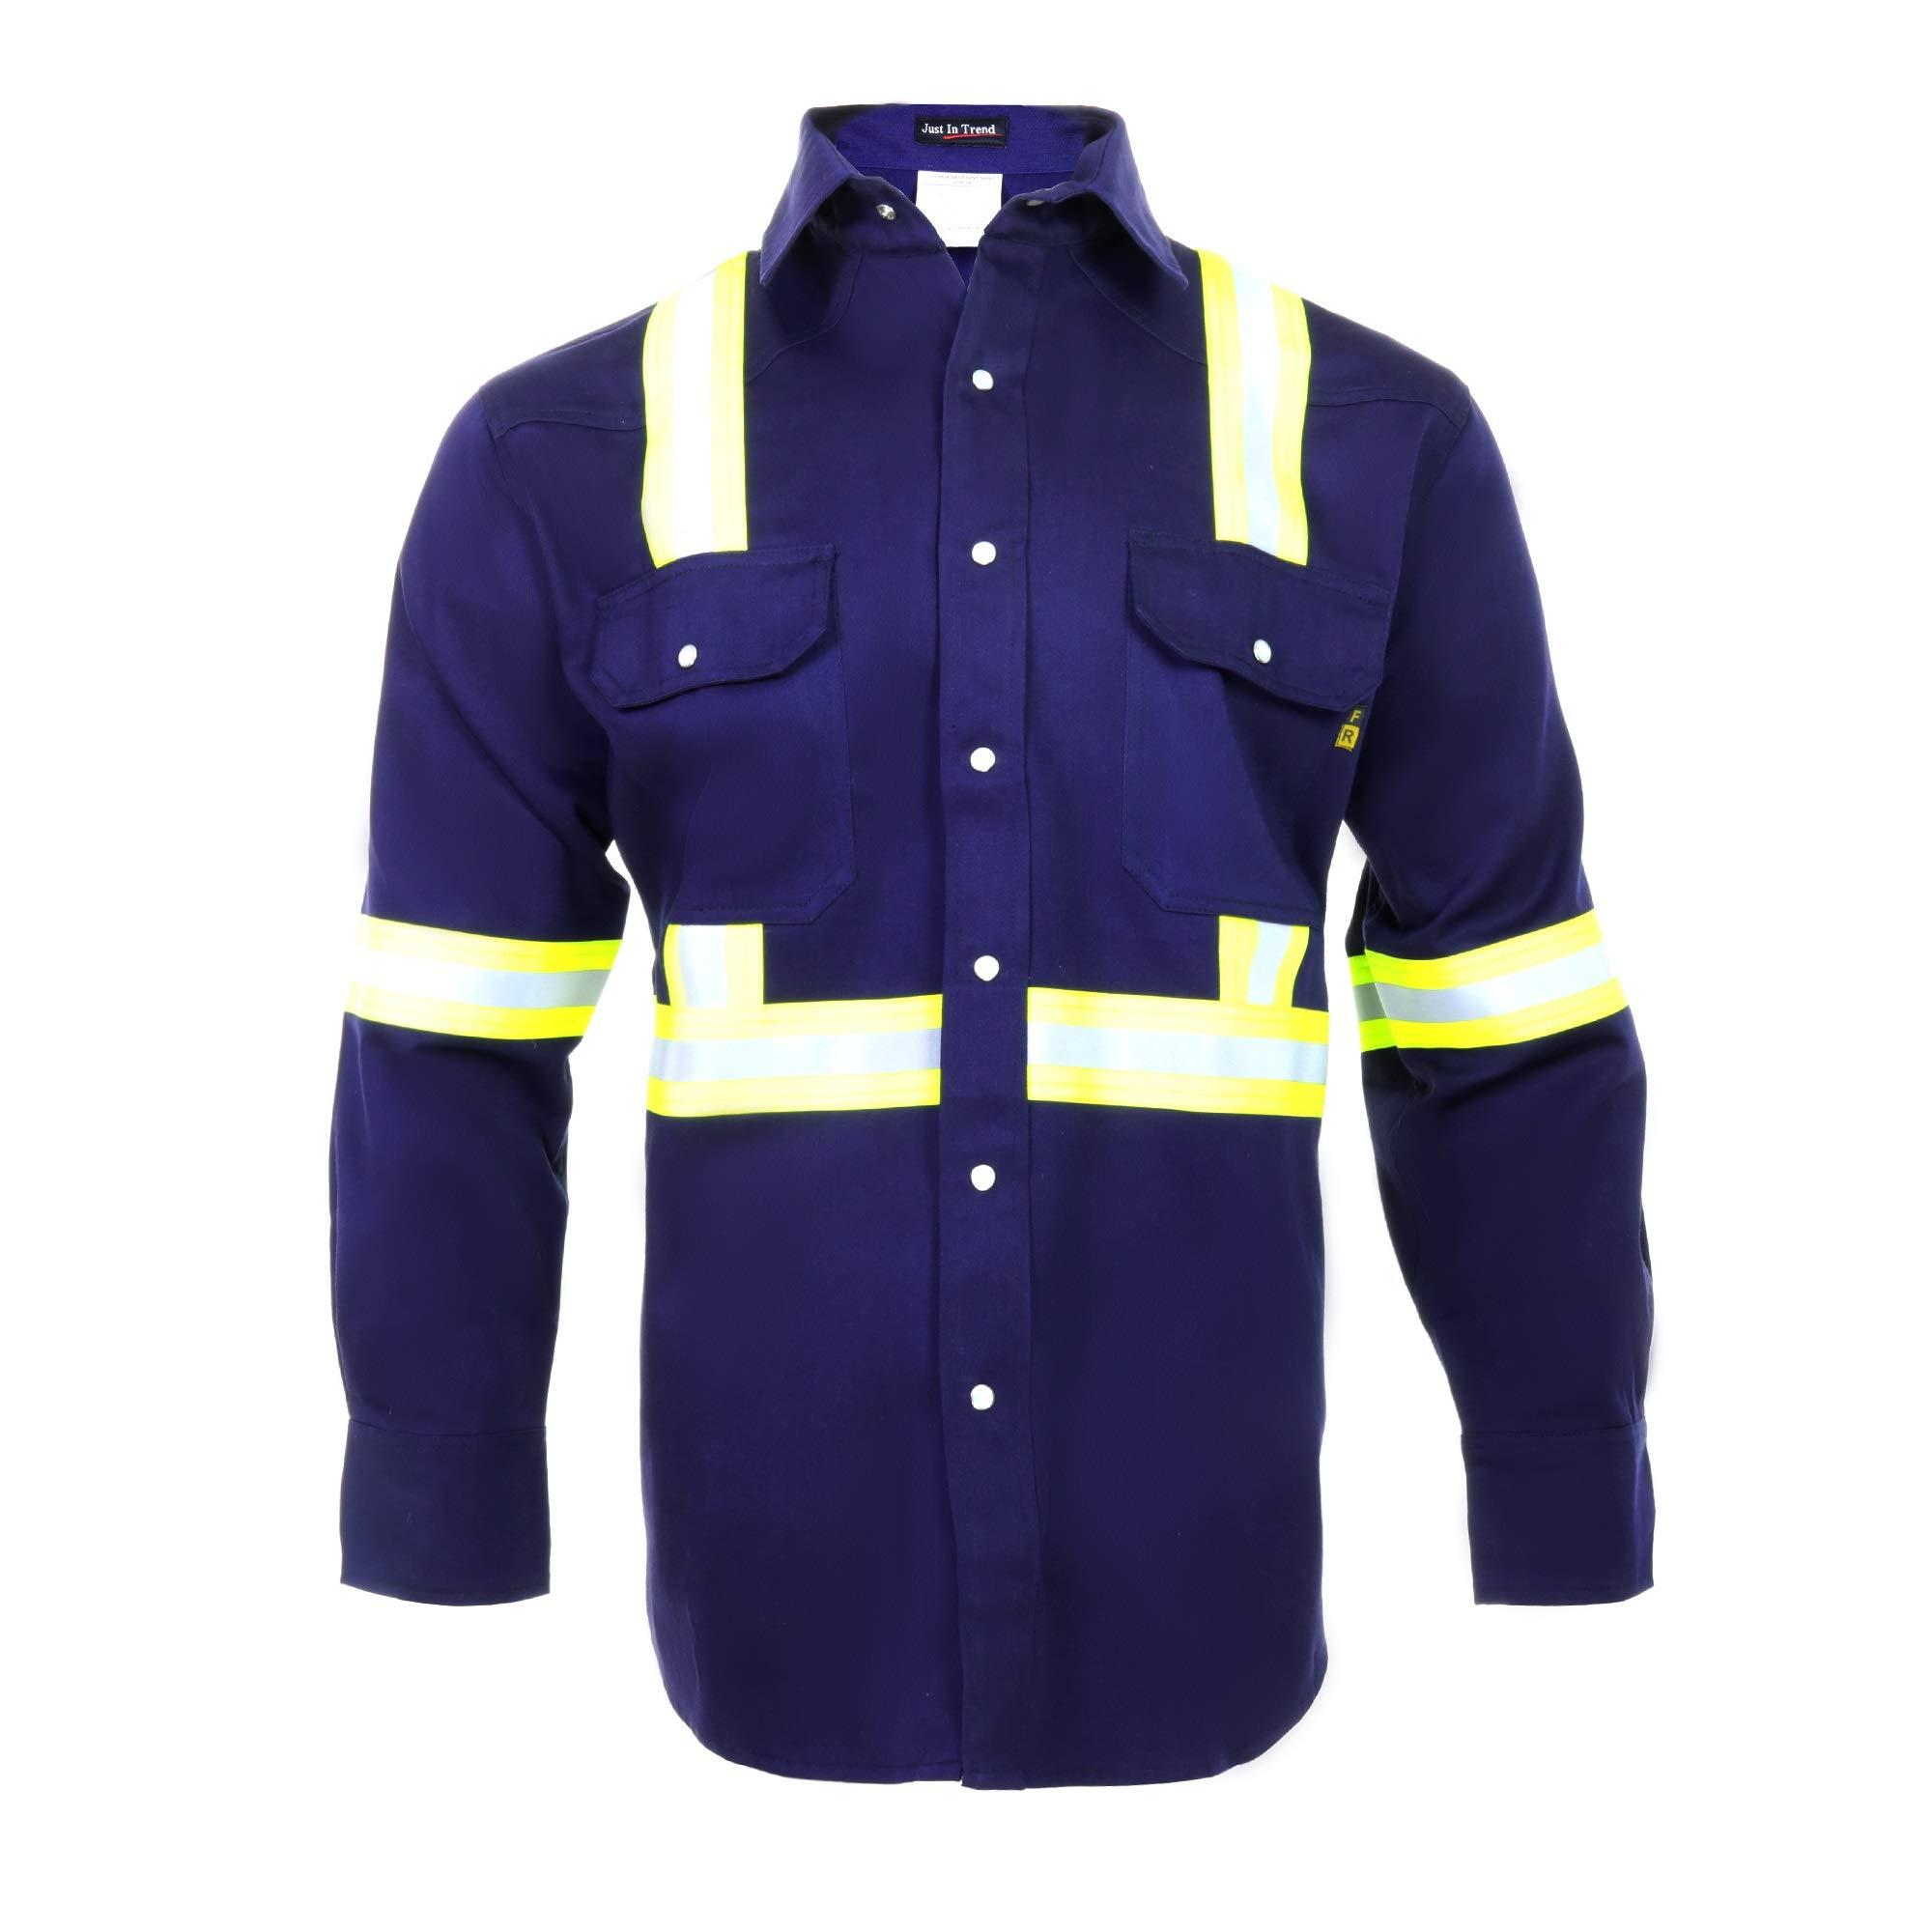 Flame Resistant High Visibility Hi Vis Shirt - 100% C - 7 oz (Large, Navy Blue)